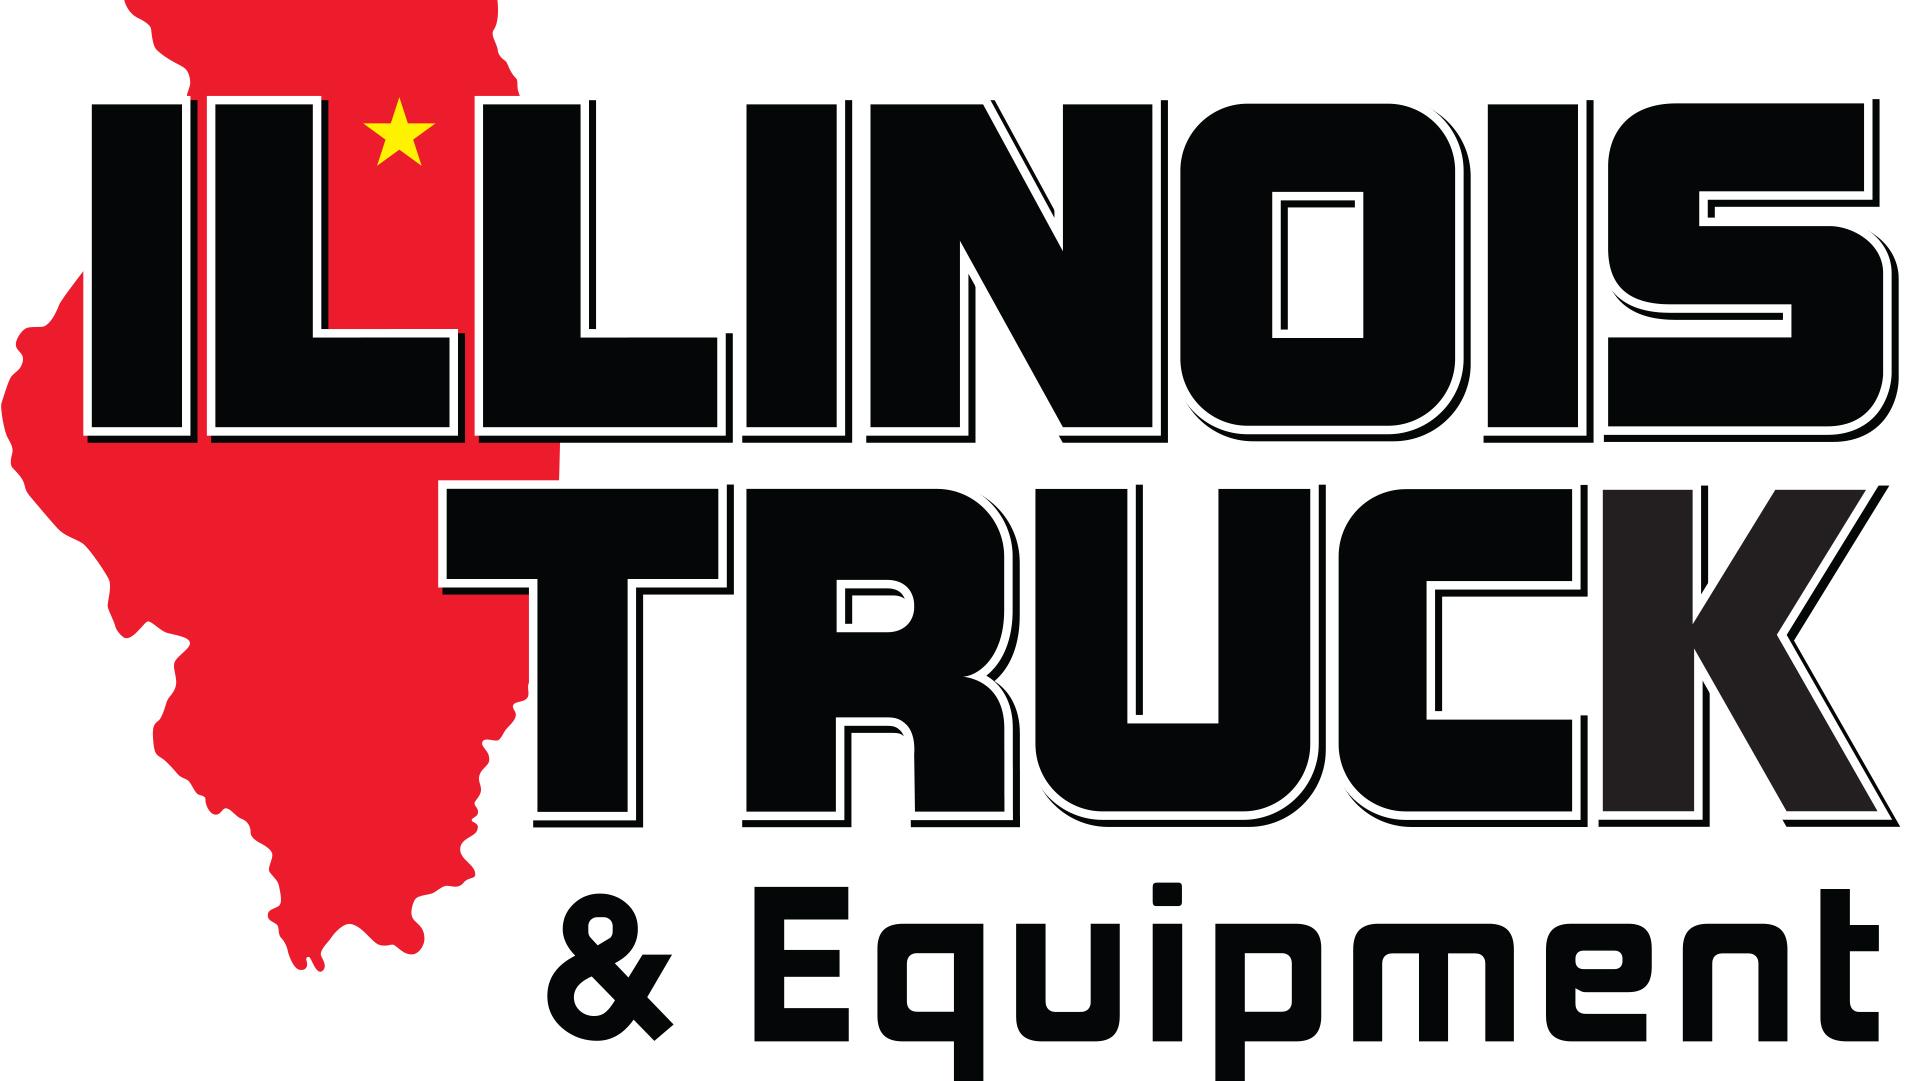 Illinois Truck & Equipment logo